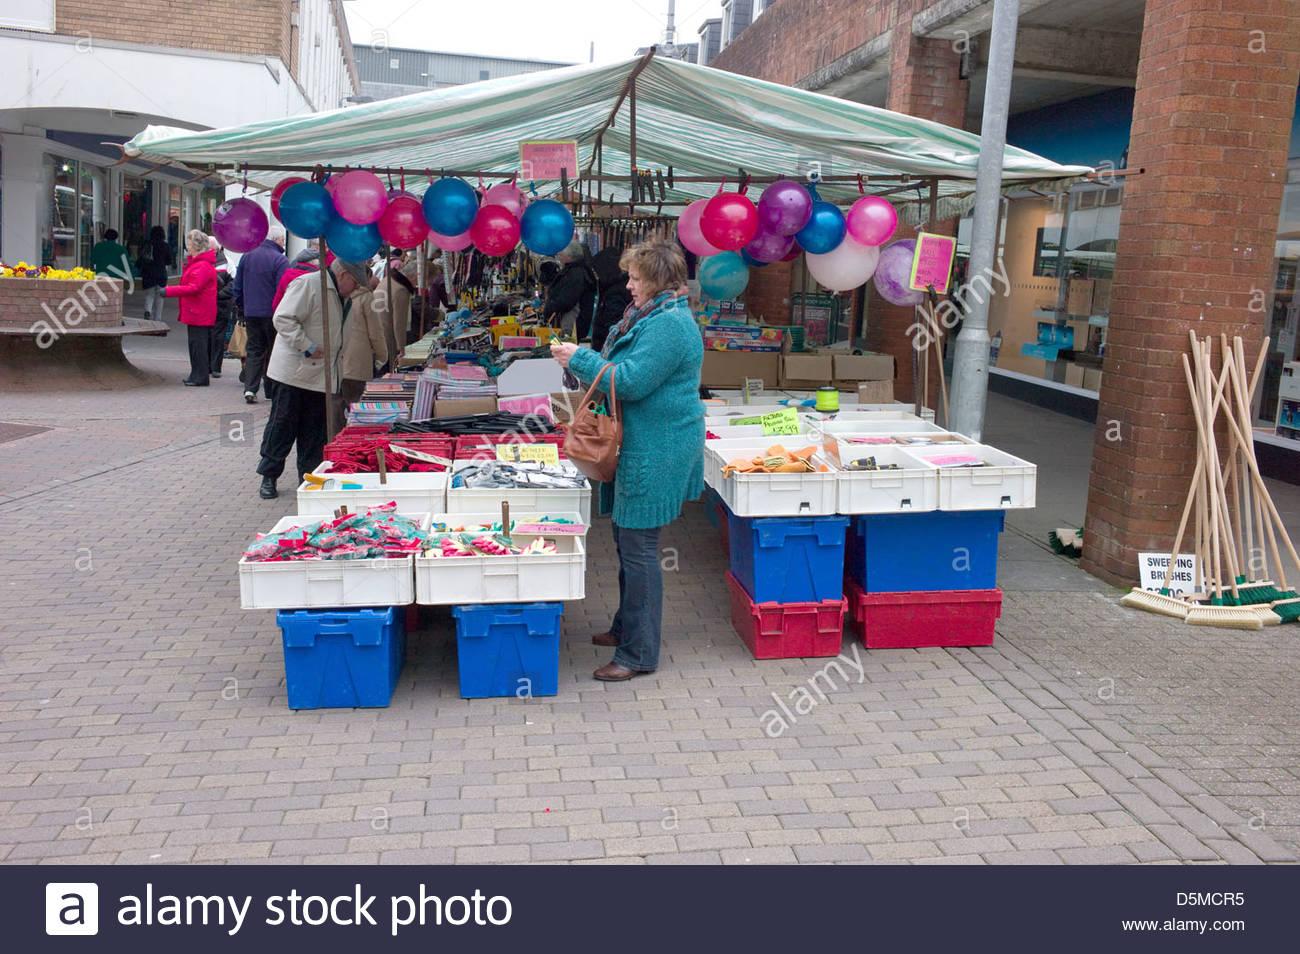 Street market, Carmarthen, Wales, UK Stock Photo